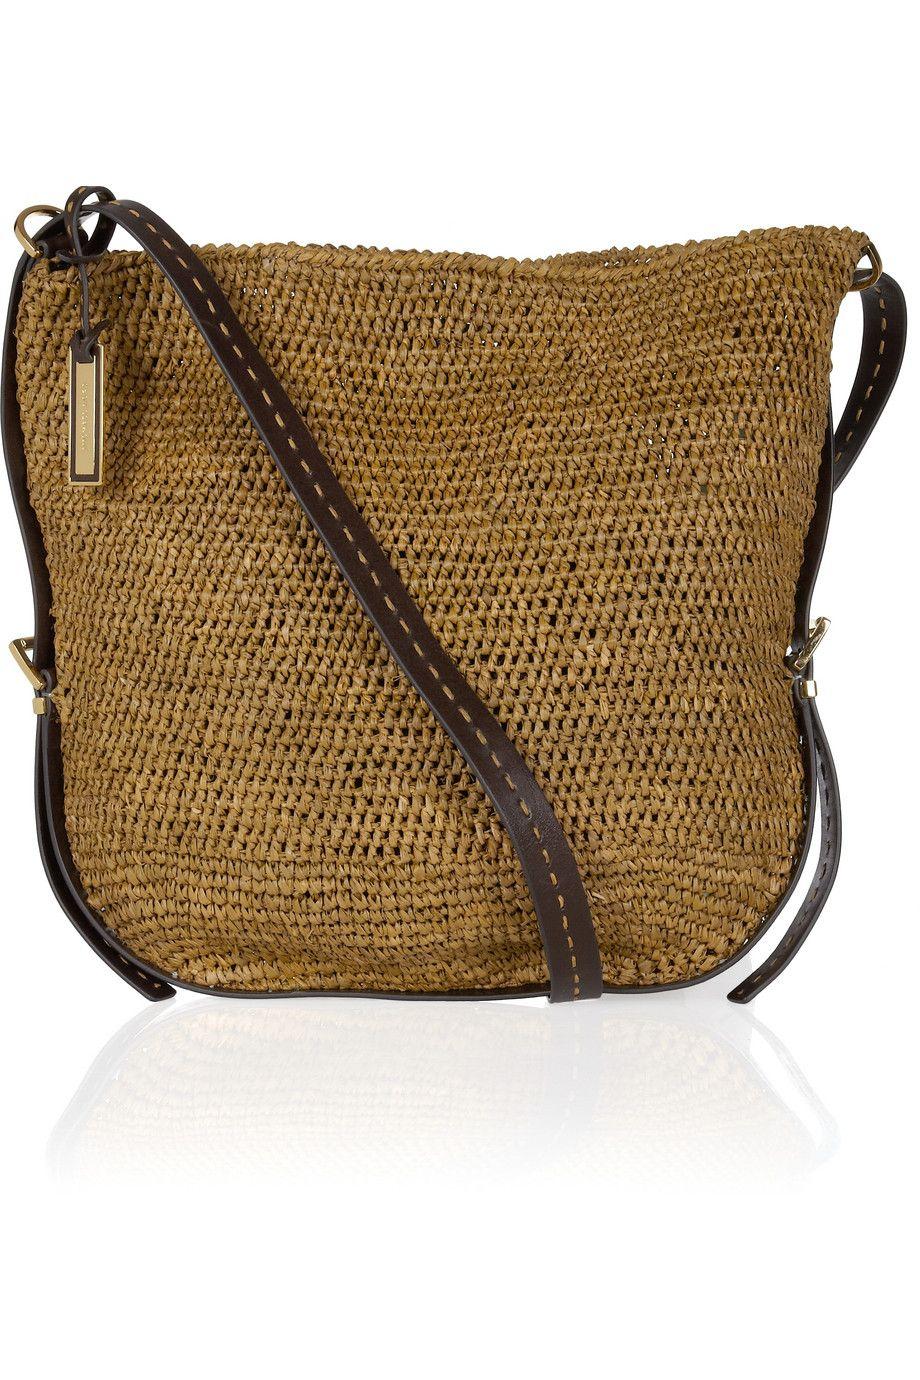 cabec5631e0300 Michael Kors Santorini woven raffia crossbody bag | Crochet HandBag ...